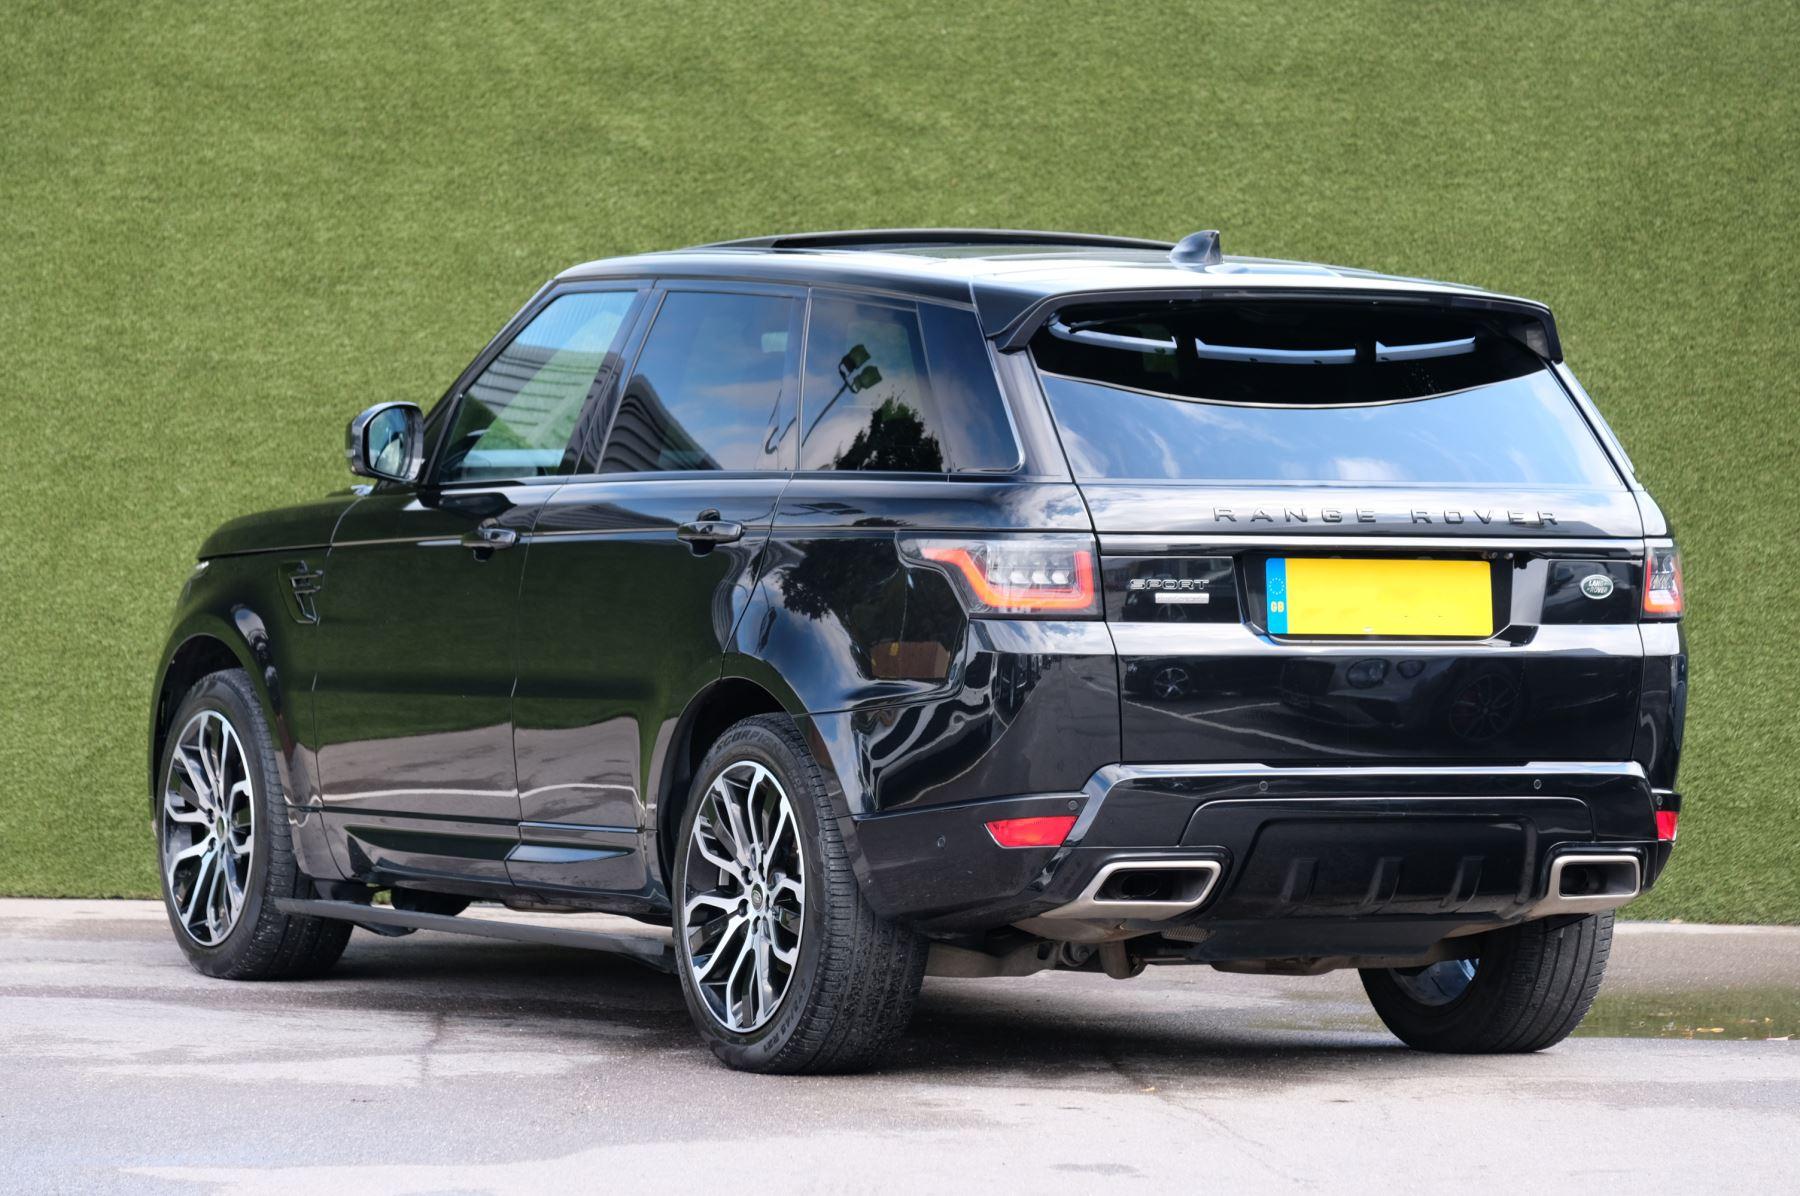 Land Rover Range Rover Sport 3.0 SDV6 Autobiography Dynamic 5dr image 2